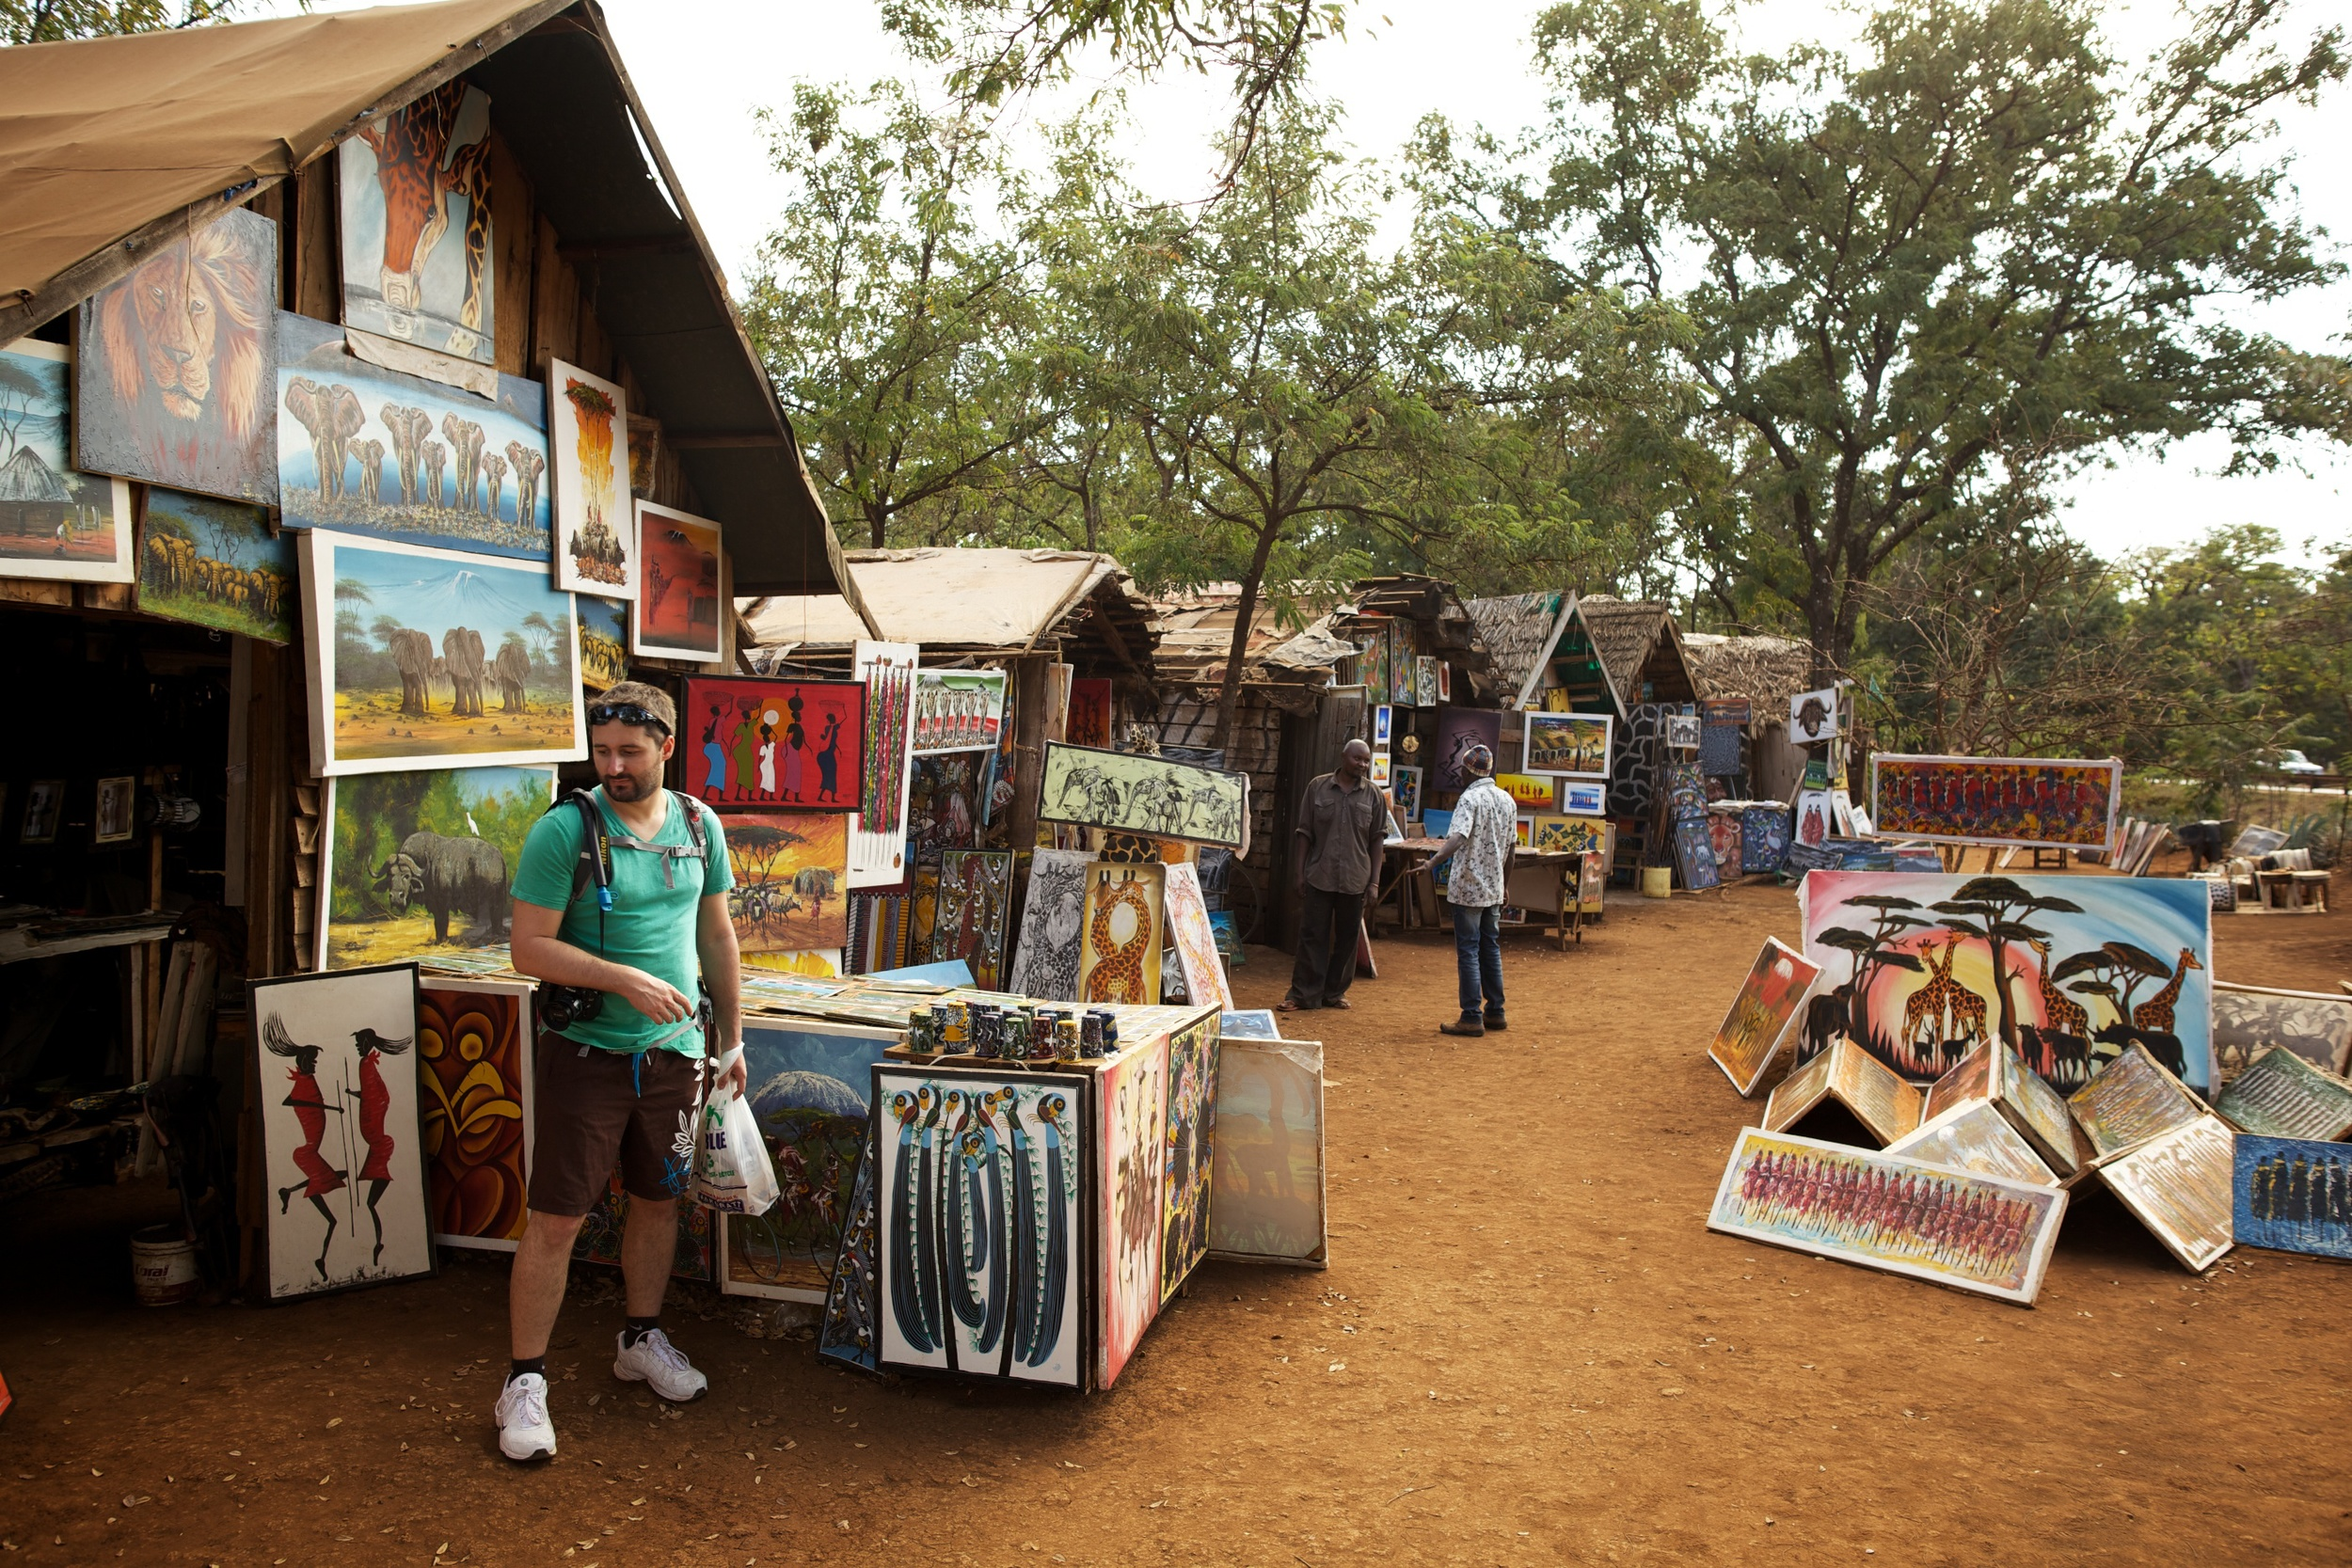 Moshi Art Handcraft Center, Tanzania, Sep 2012